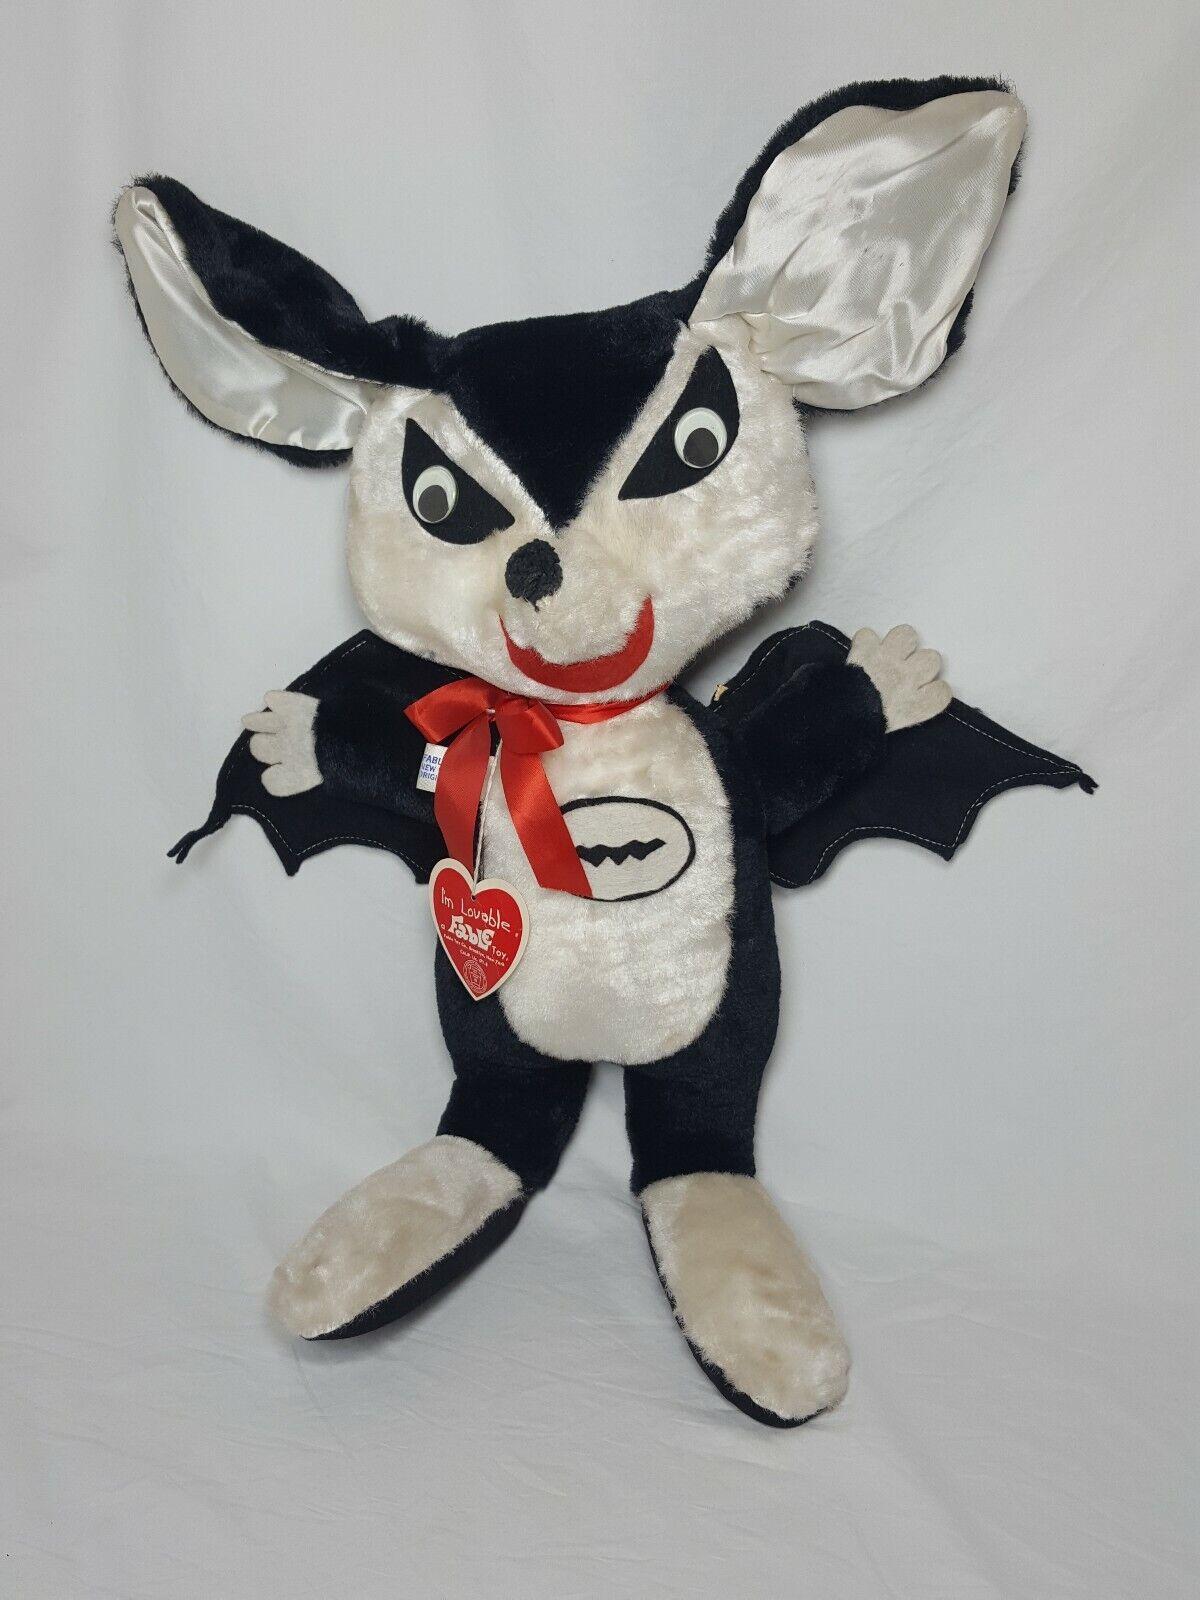 Winged Bat Fable Toys Co. Plush Stuffed Animal Haloween Rare Vintage